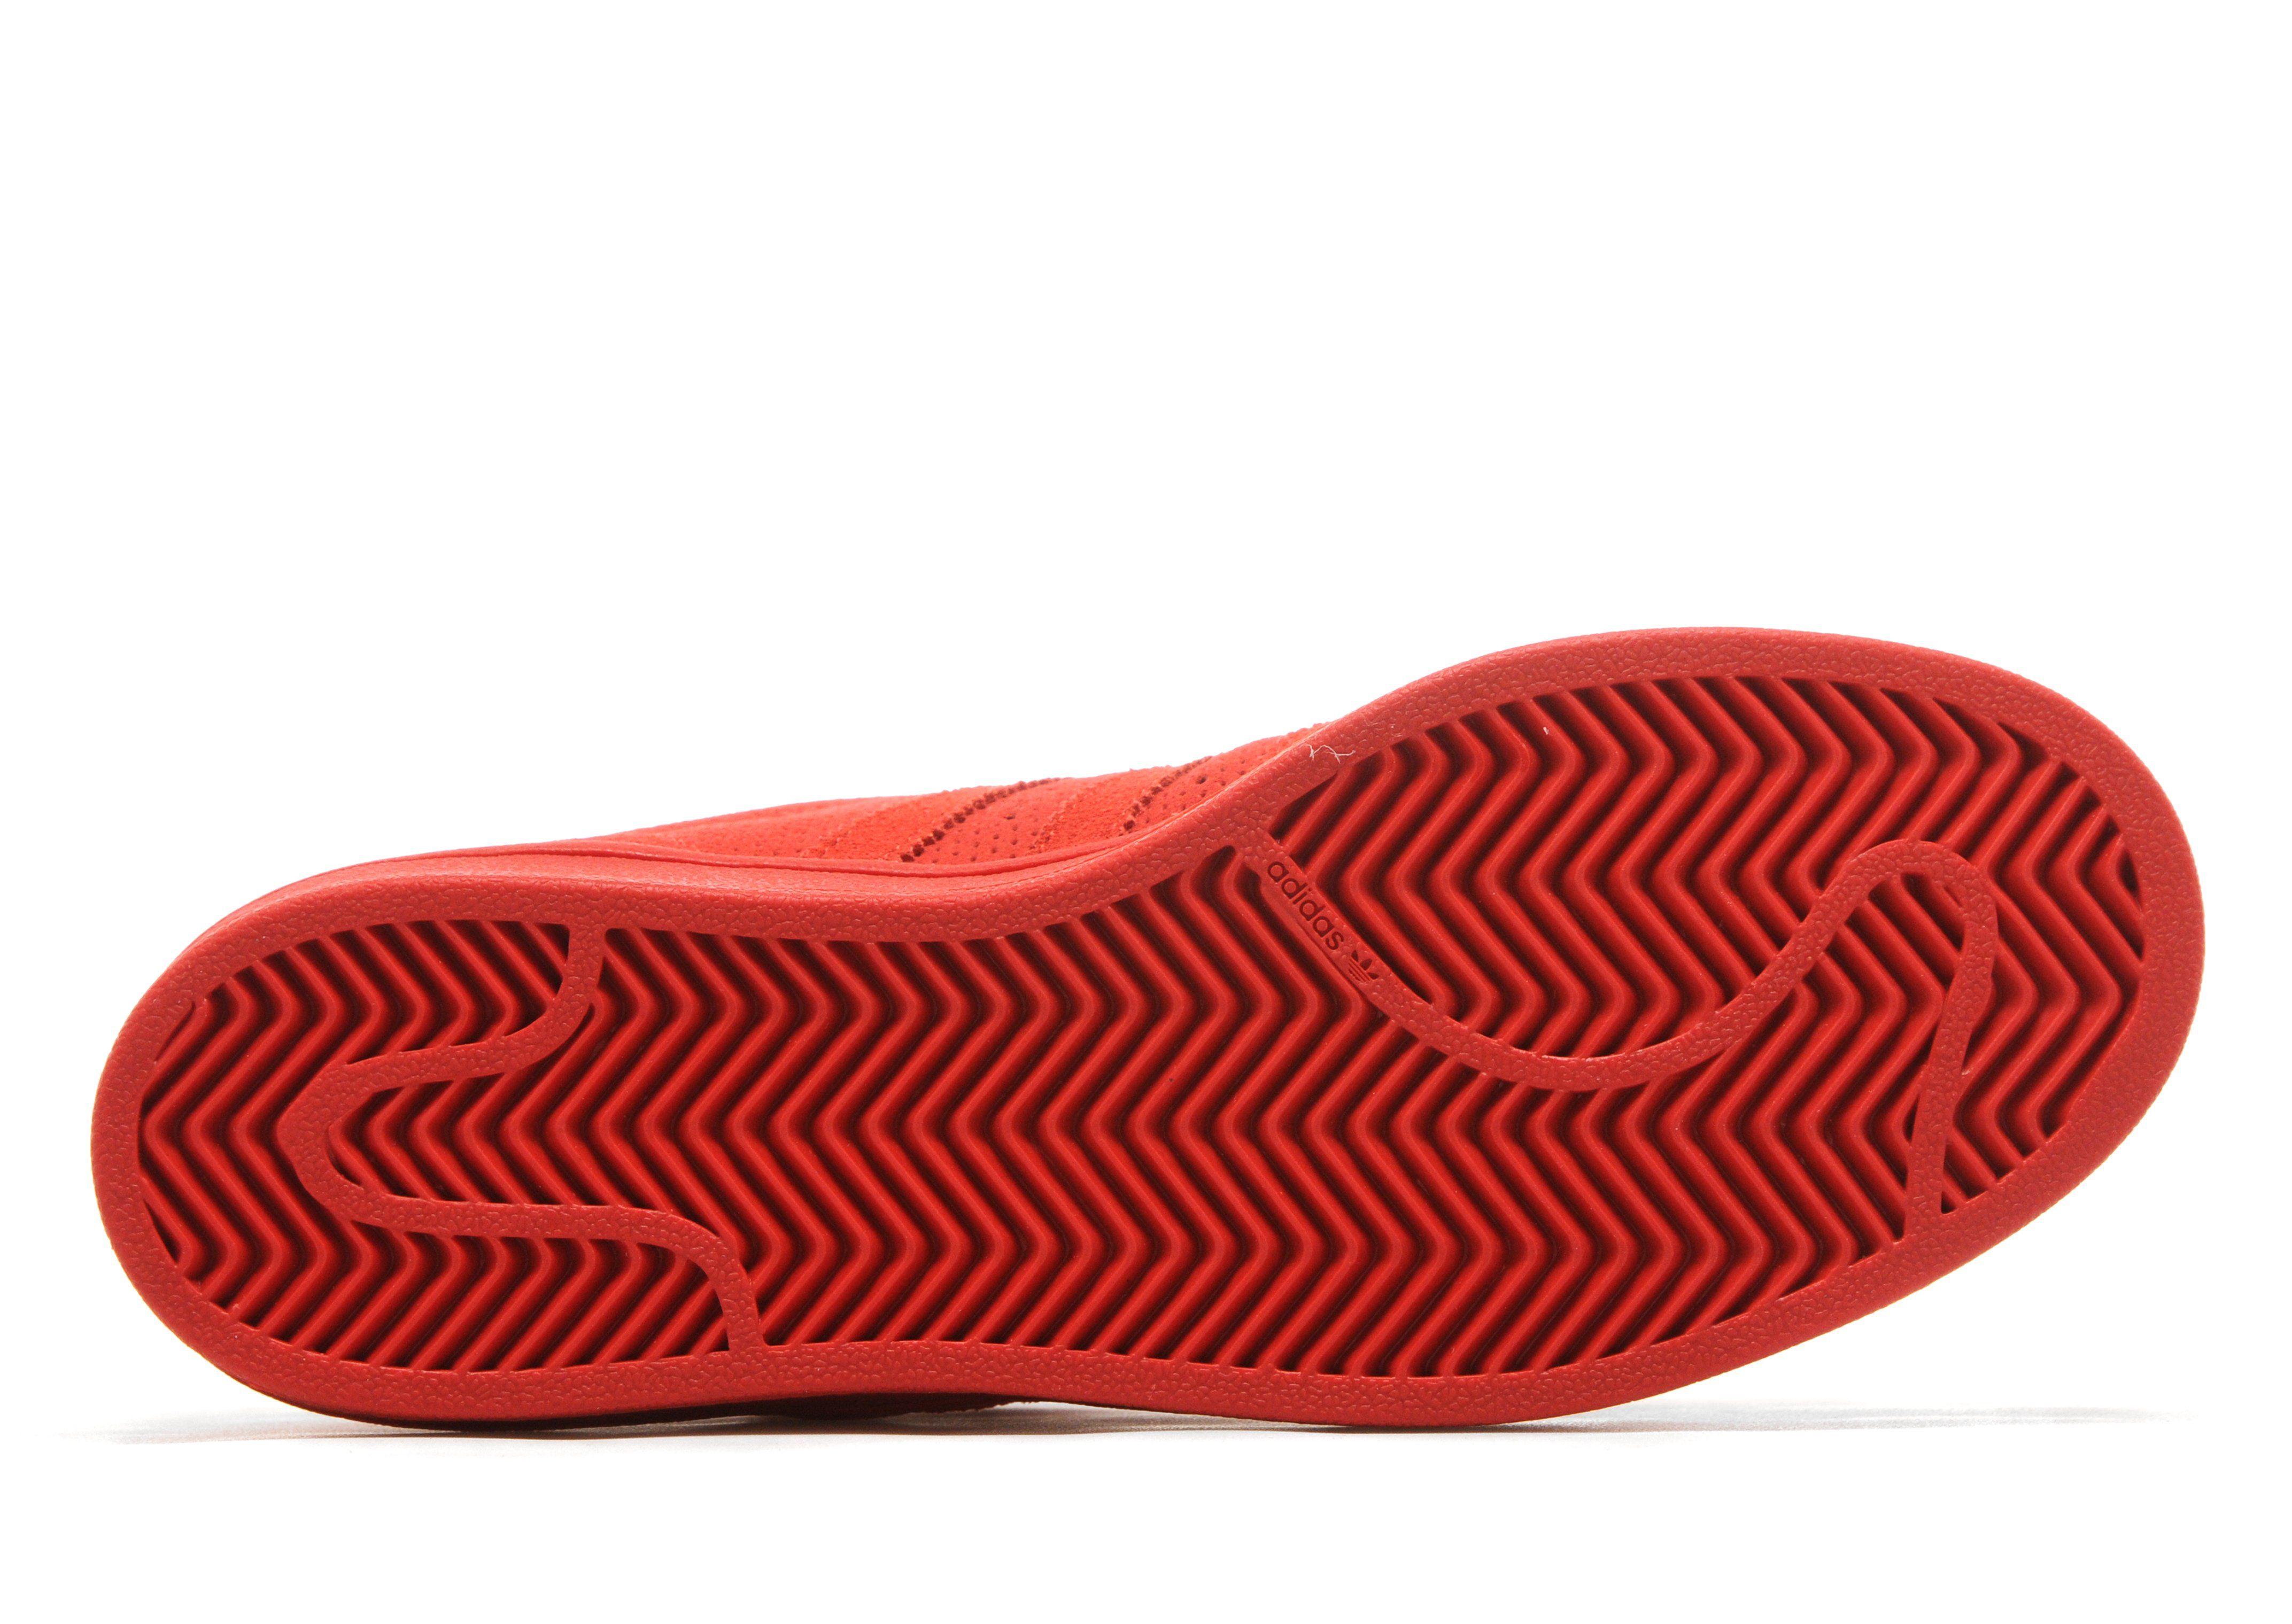 adidas Originals Superstar RT Women's